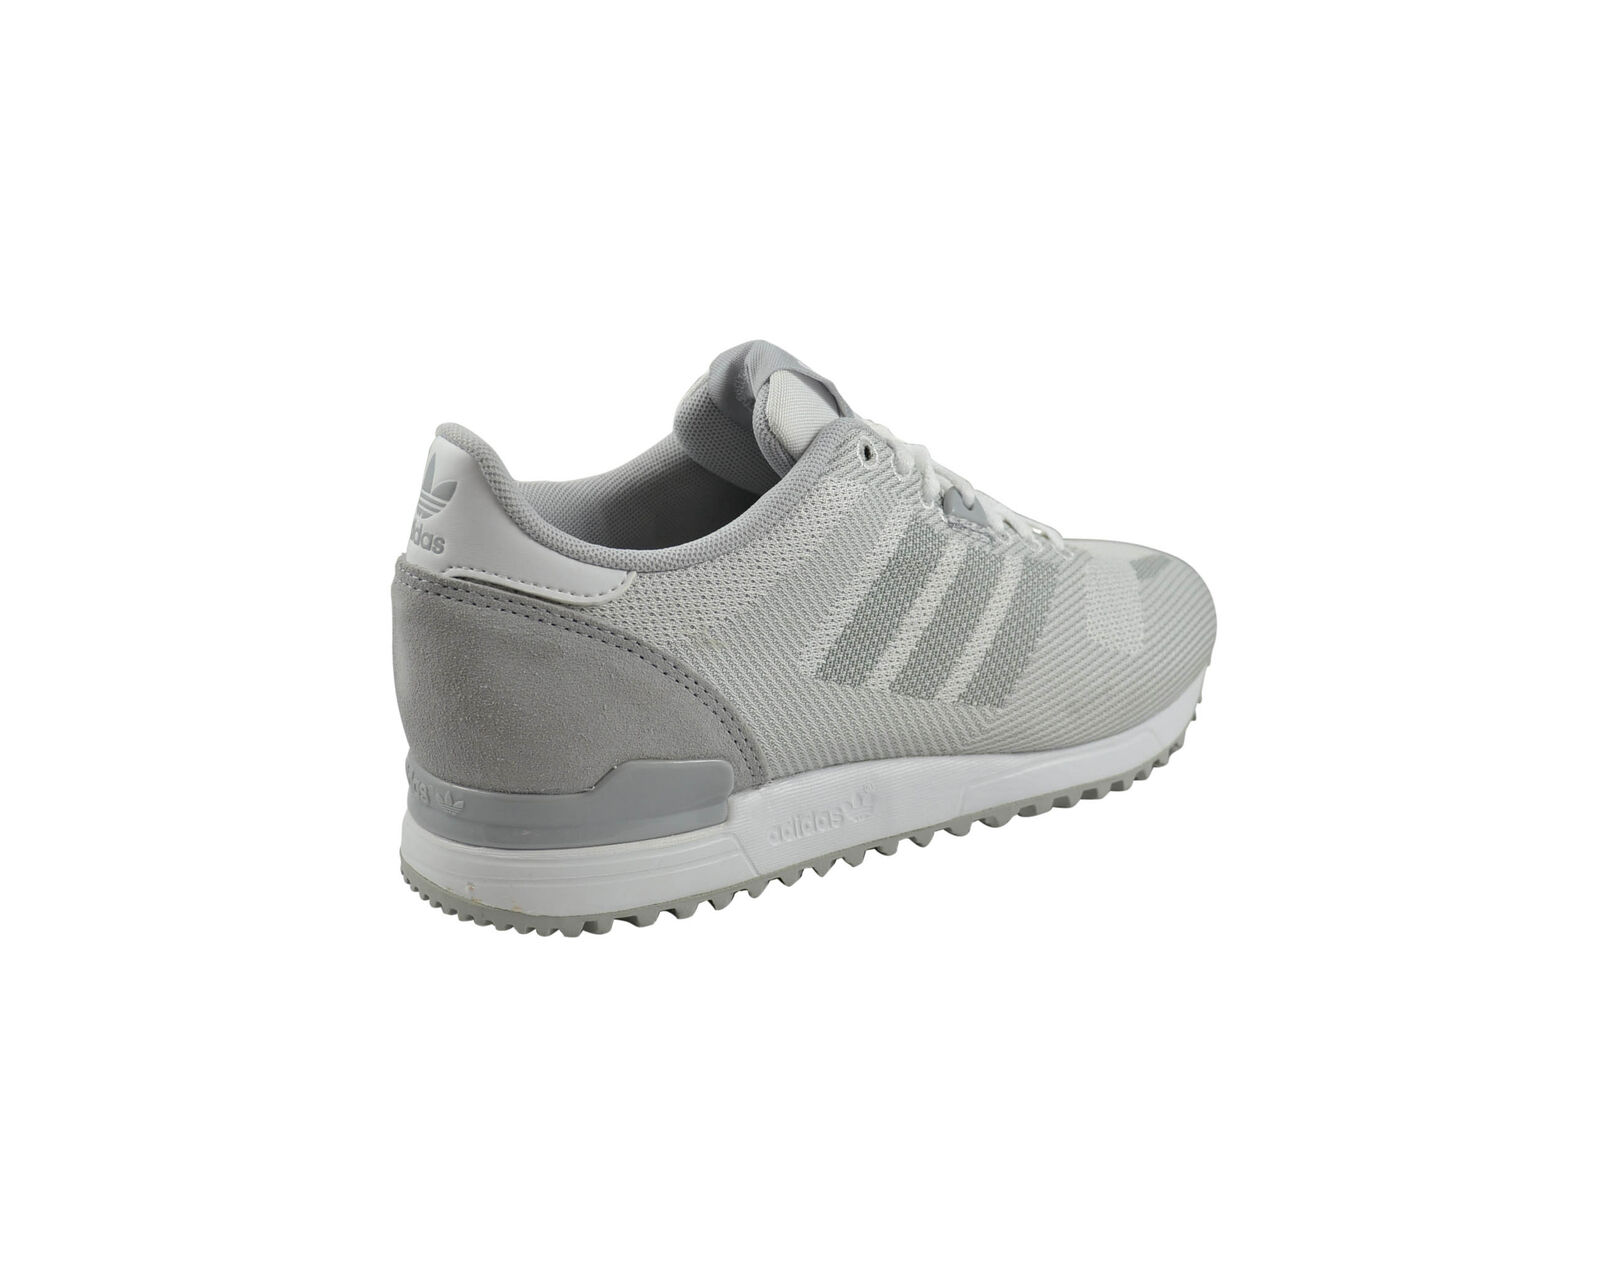 Adidas ZX 700 Weave W W W vinwht clonix ftwwht Schuhe Turnschuhe grau weiß ad016d